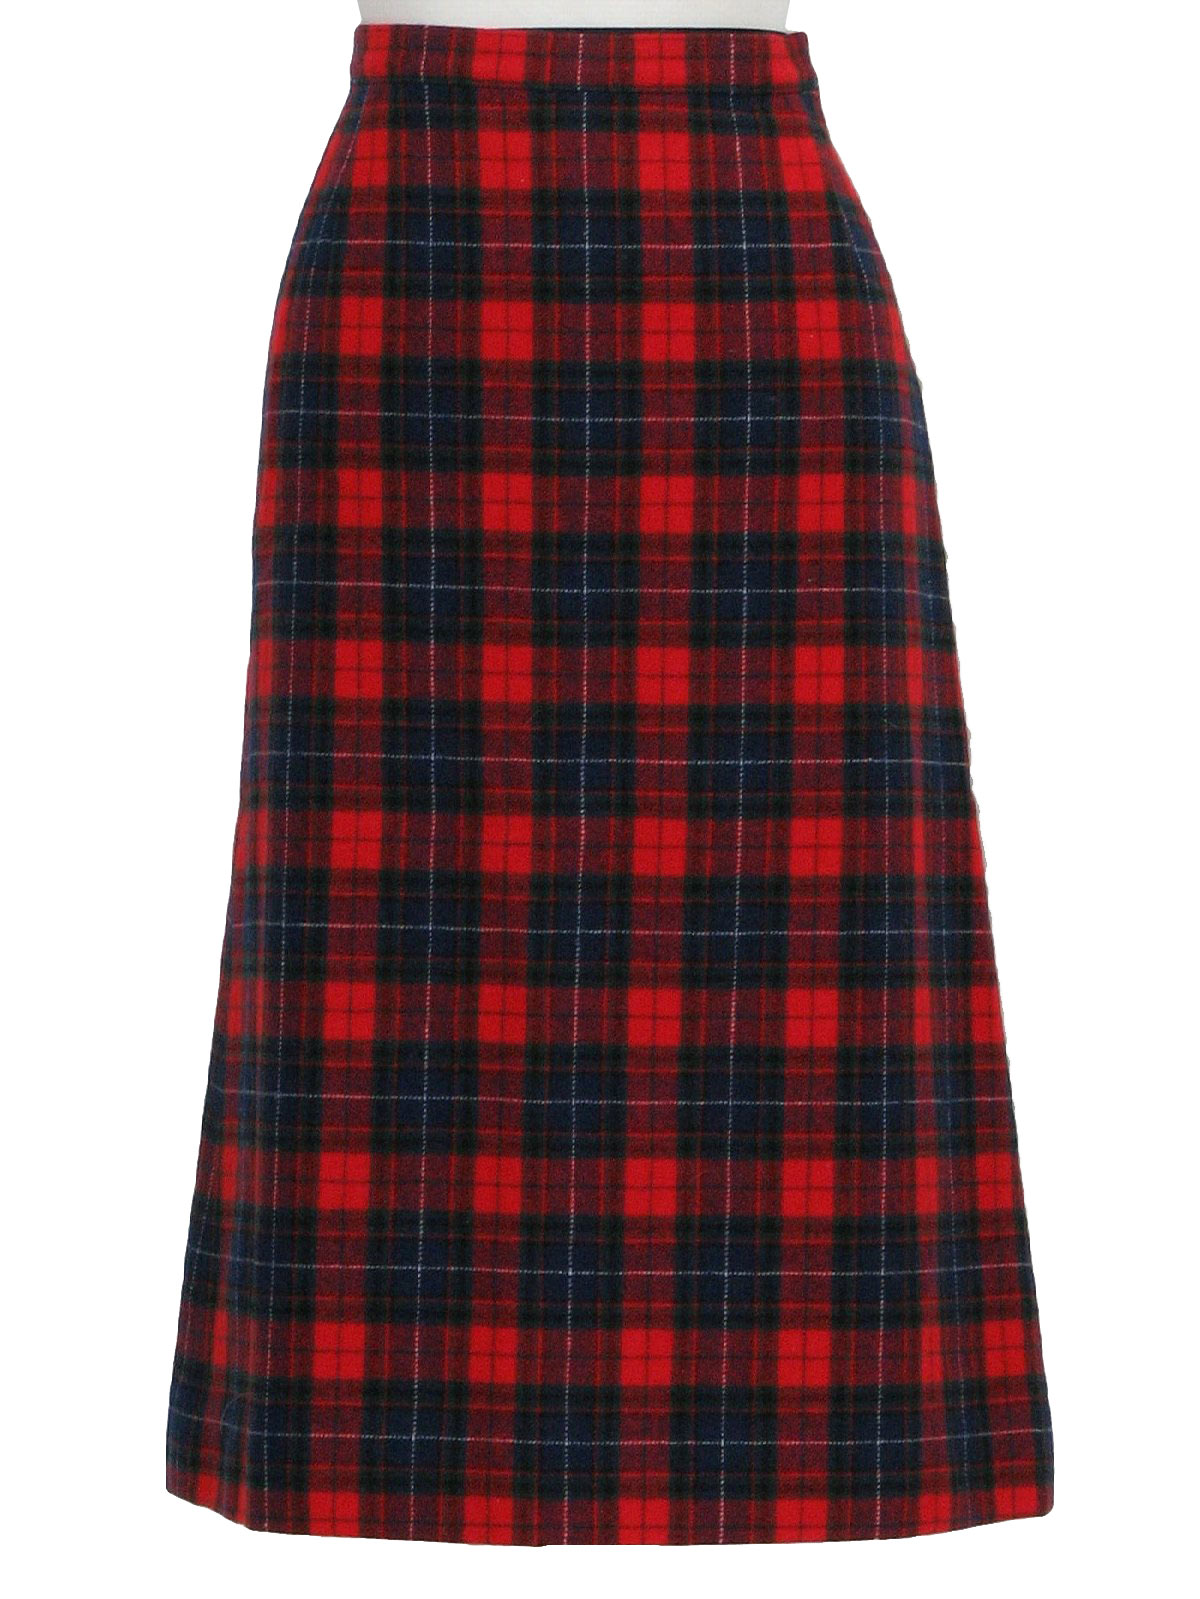 Seventies Pendleton Plaid Skirt 70s Pendleton Womens